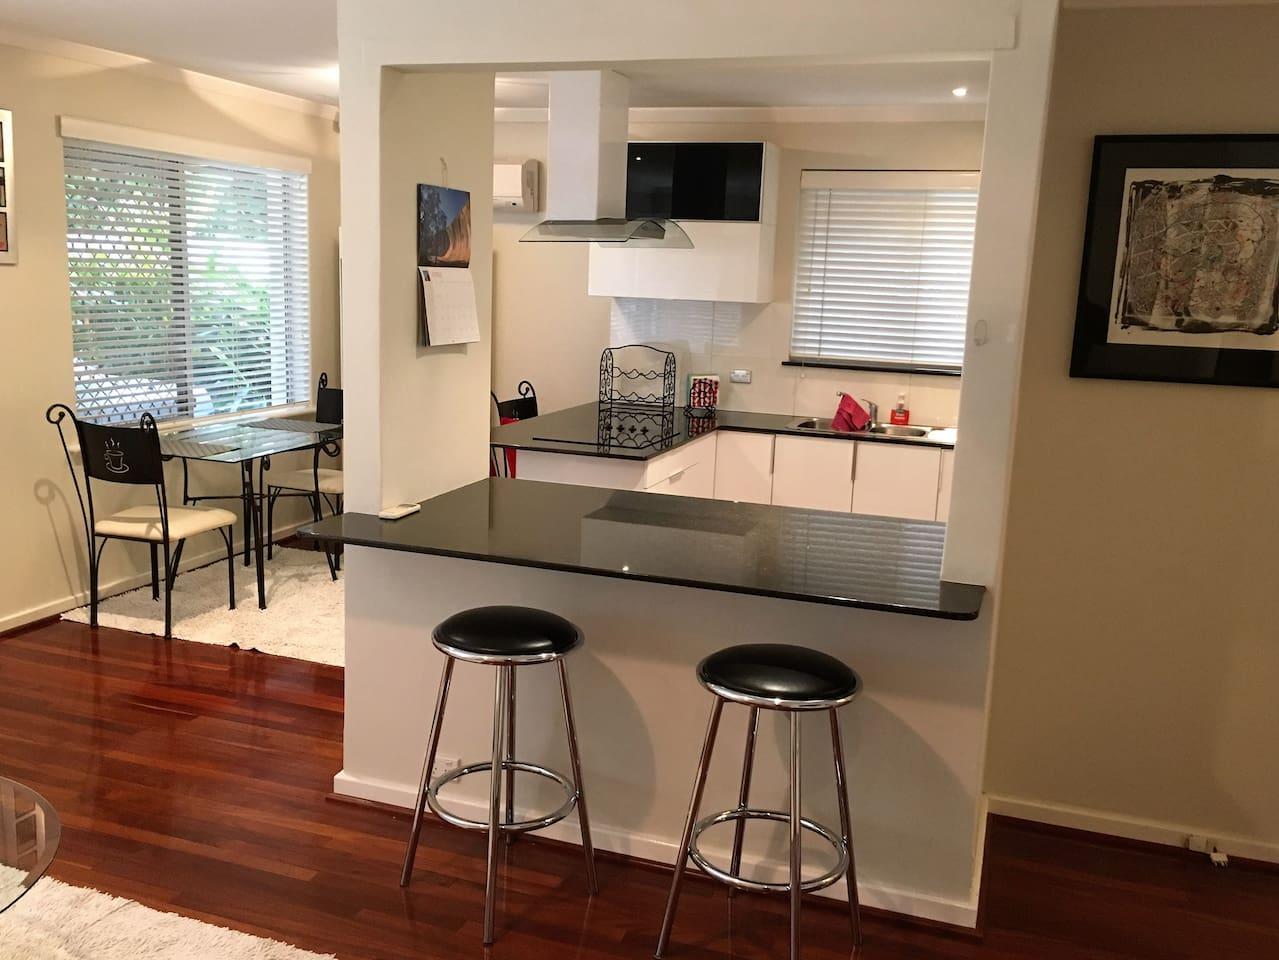 Jarrah polished floors,granite bench tops